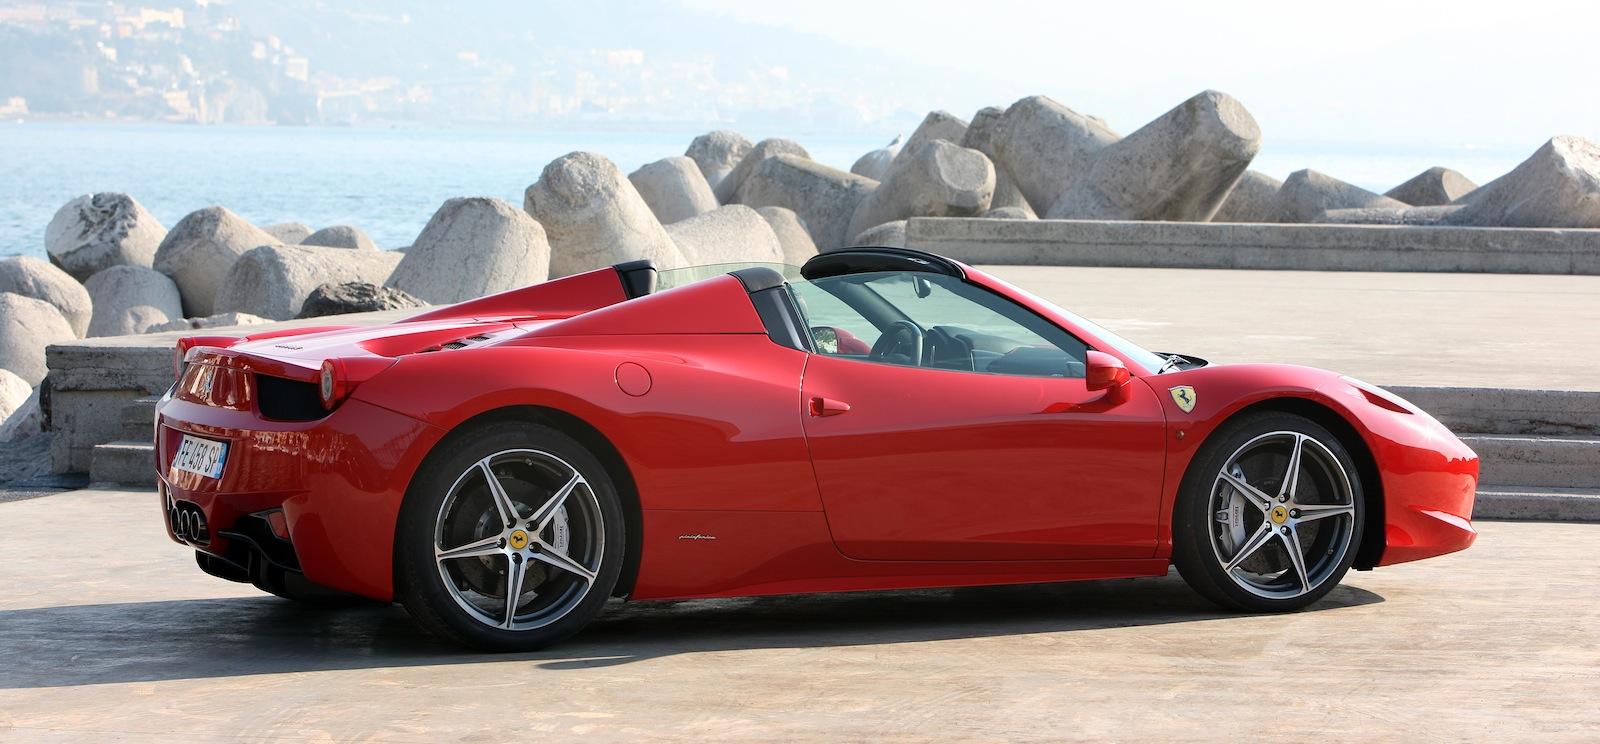 2018 Ferrari 488 Gtb Specs And Price >> Ferrari 458 Spider Review | CarAdvice